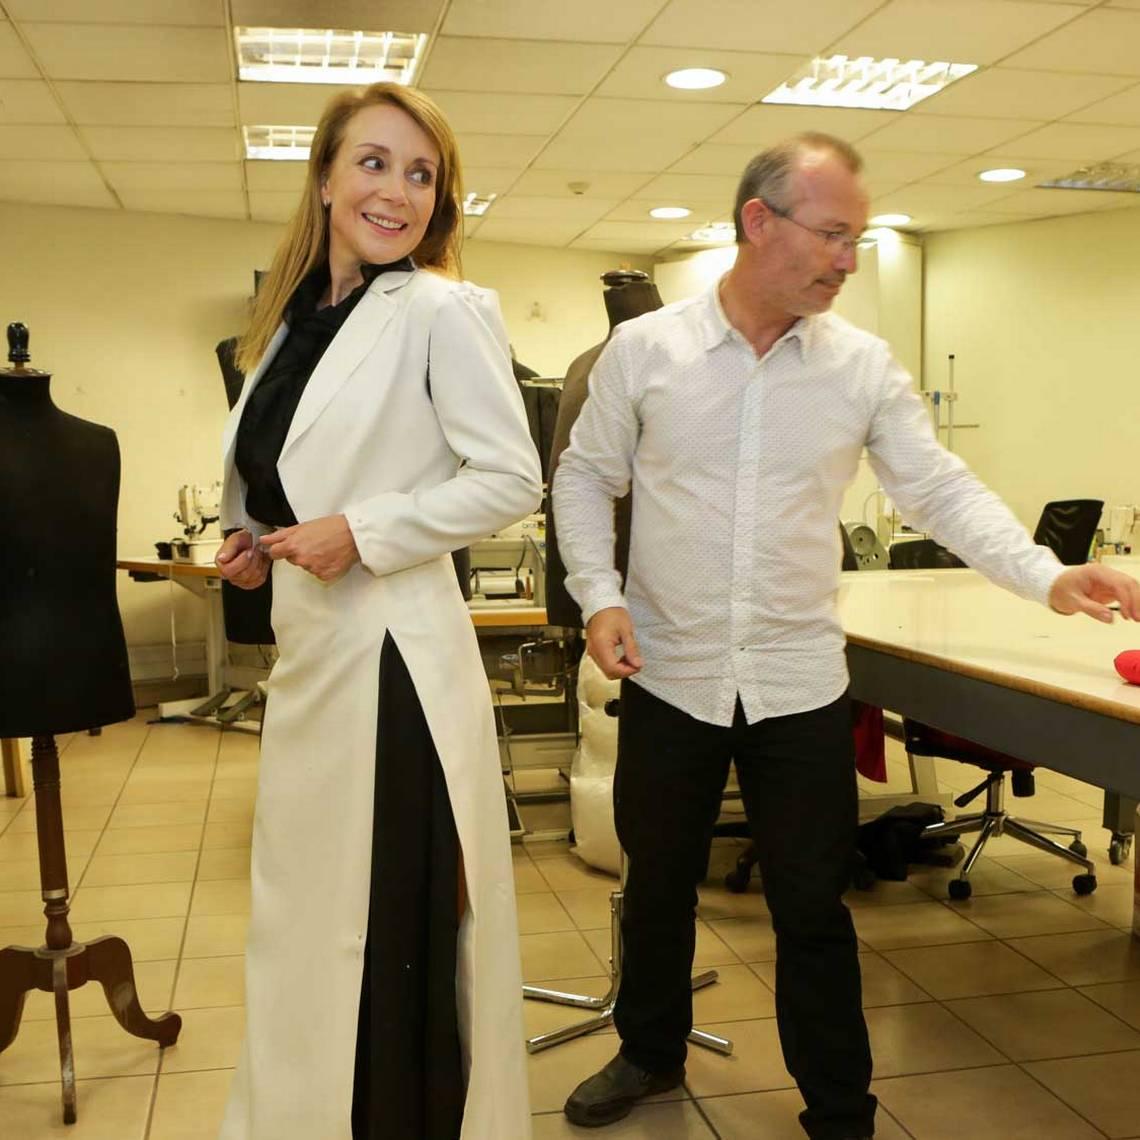 Karen Doggenweiler ultima detalles de traje con que sorprenderá en Olmué